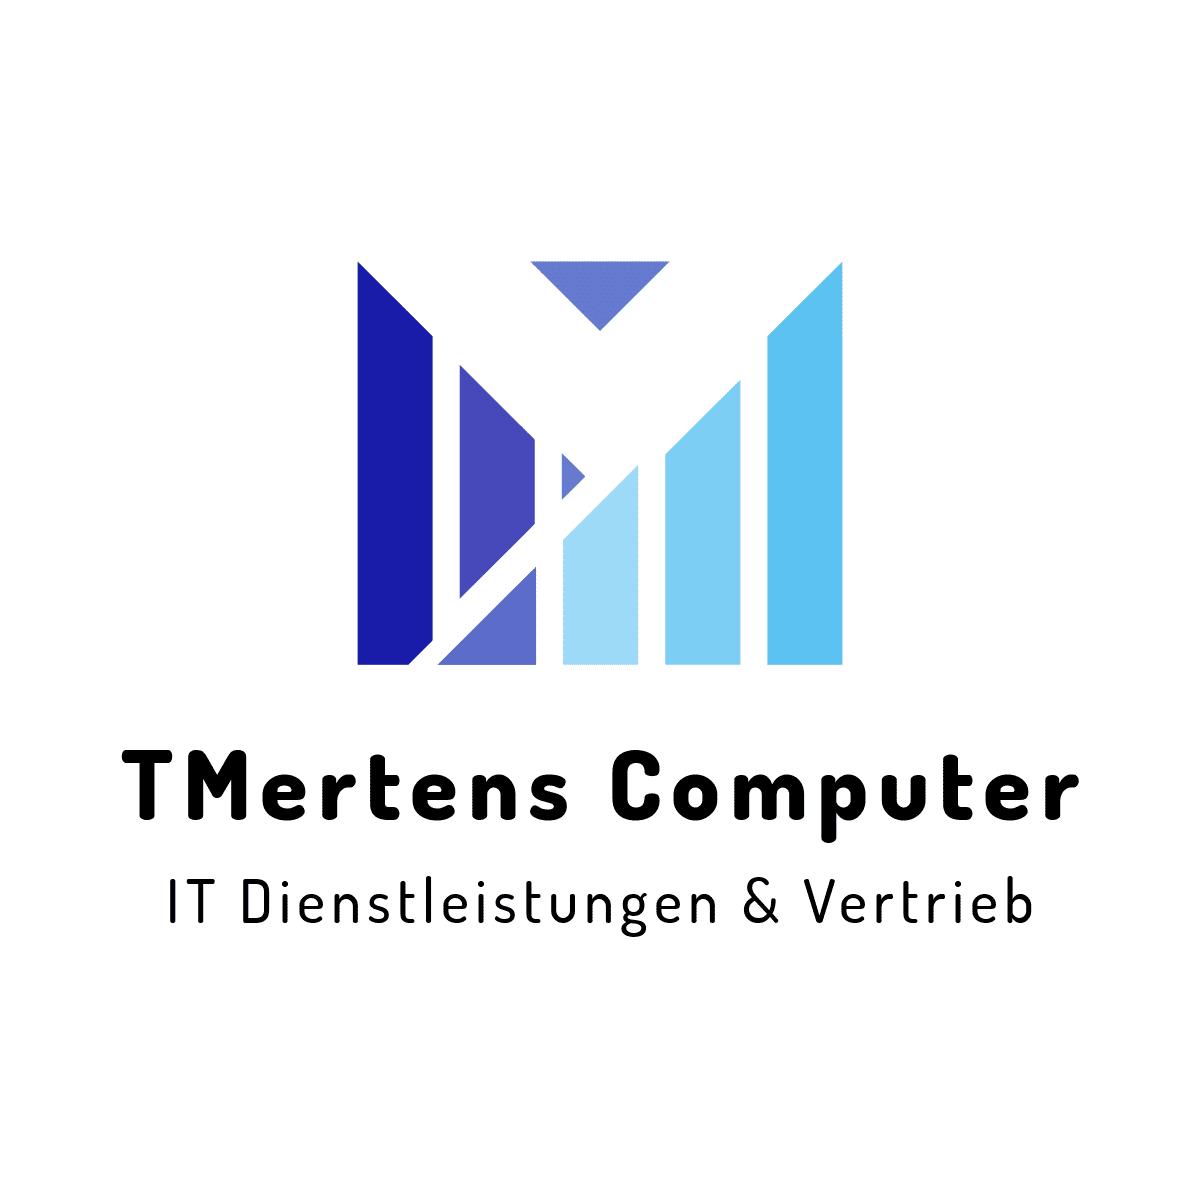 TMertens Computer